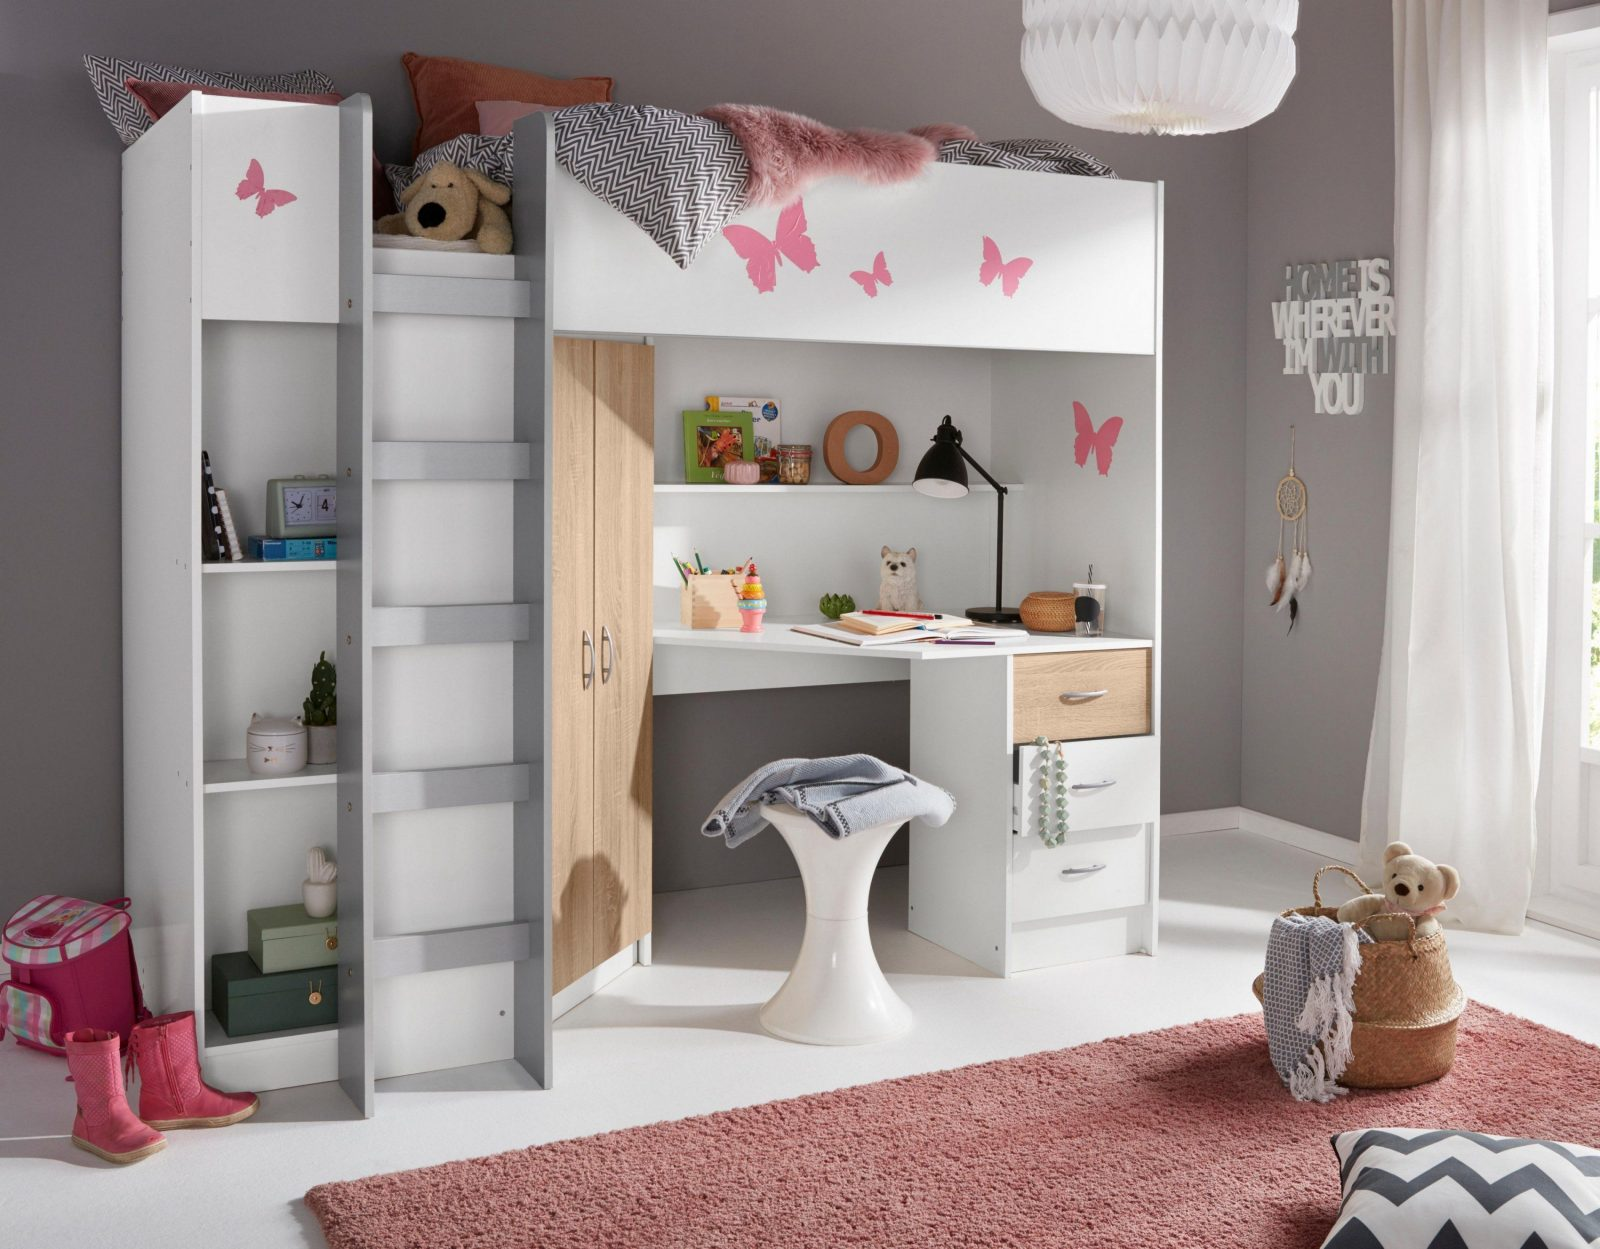 Ikea Etagenbett Metall : Möbel etagenbett ikea hochbett metall kura